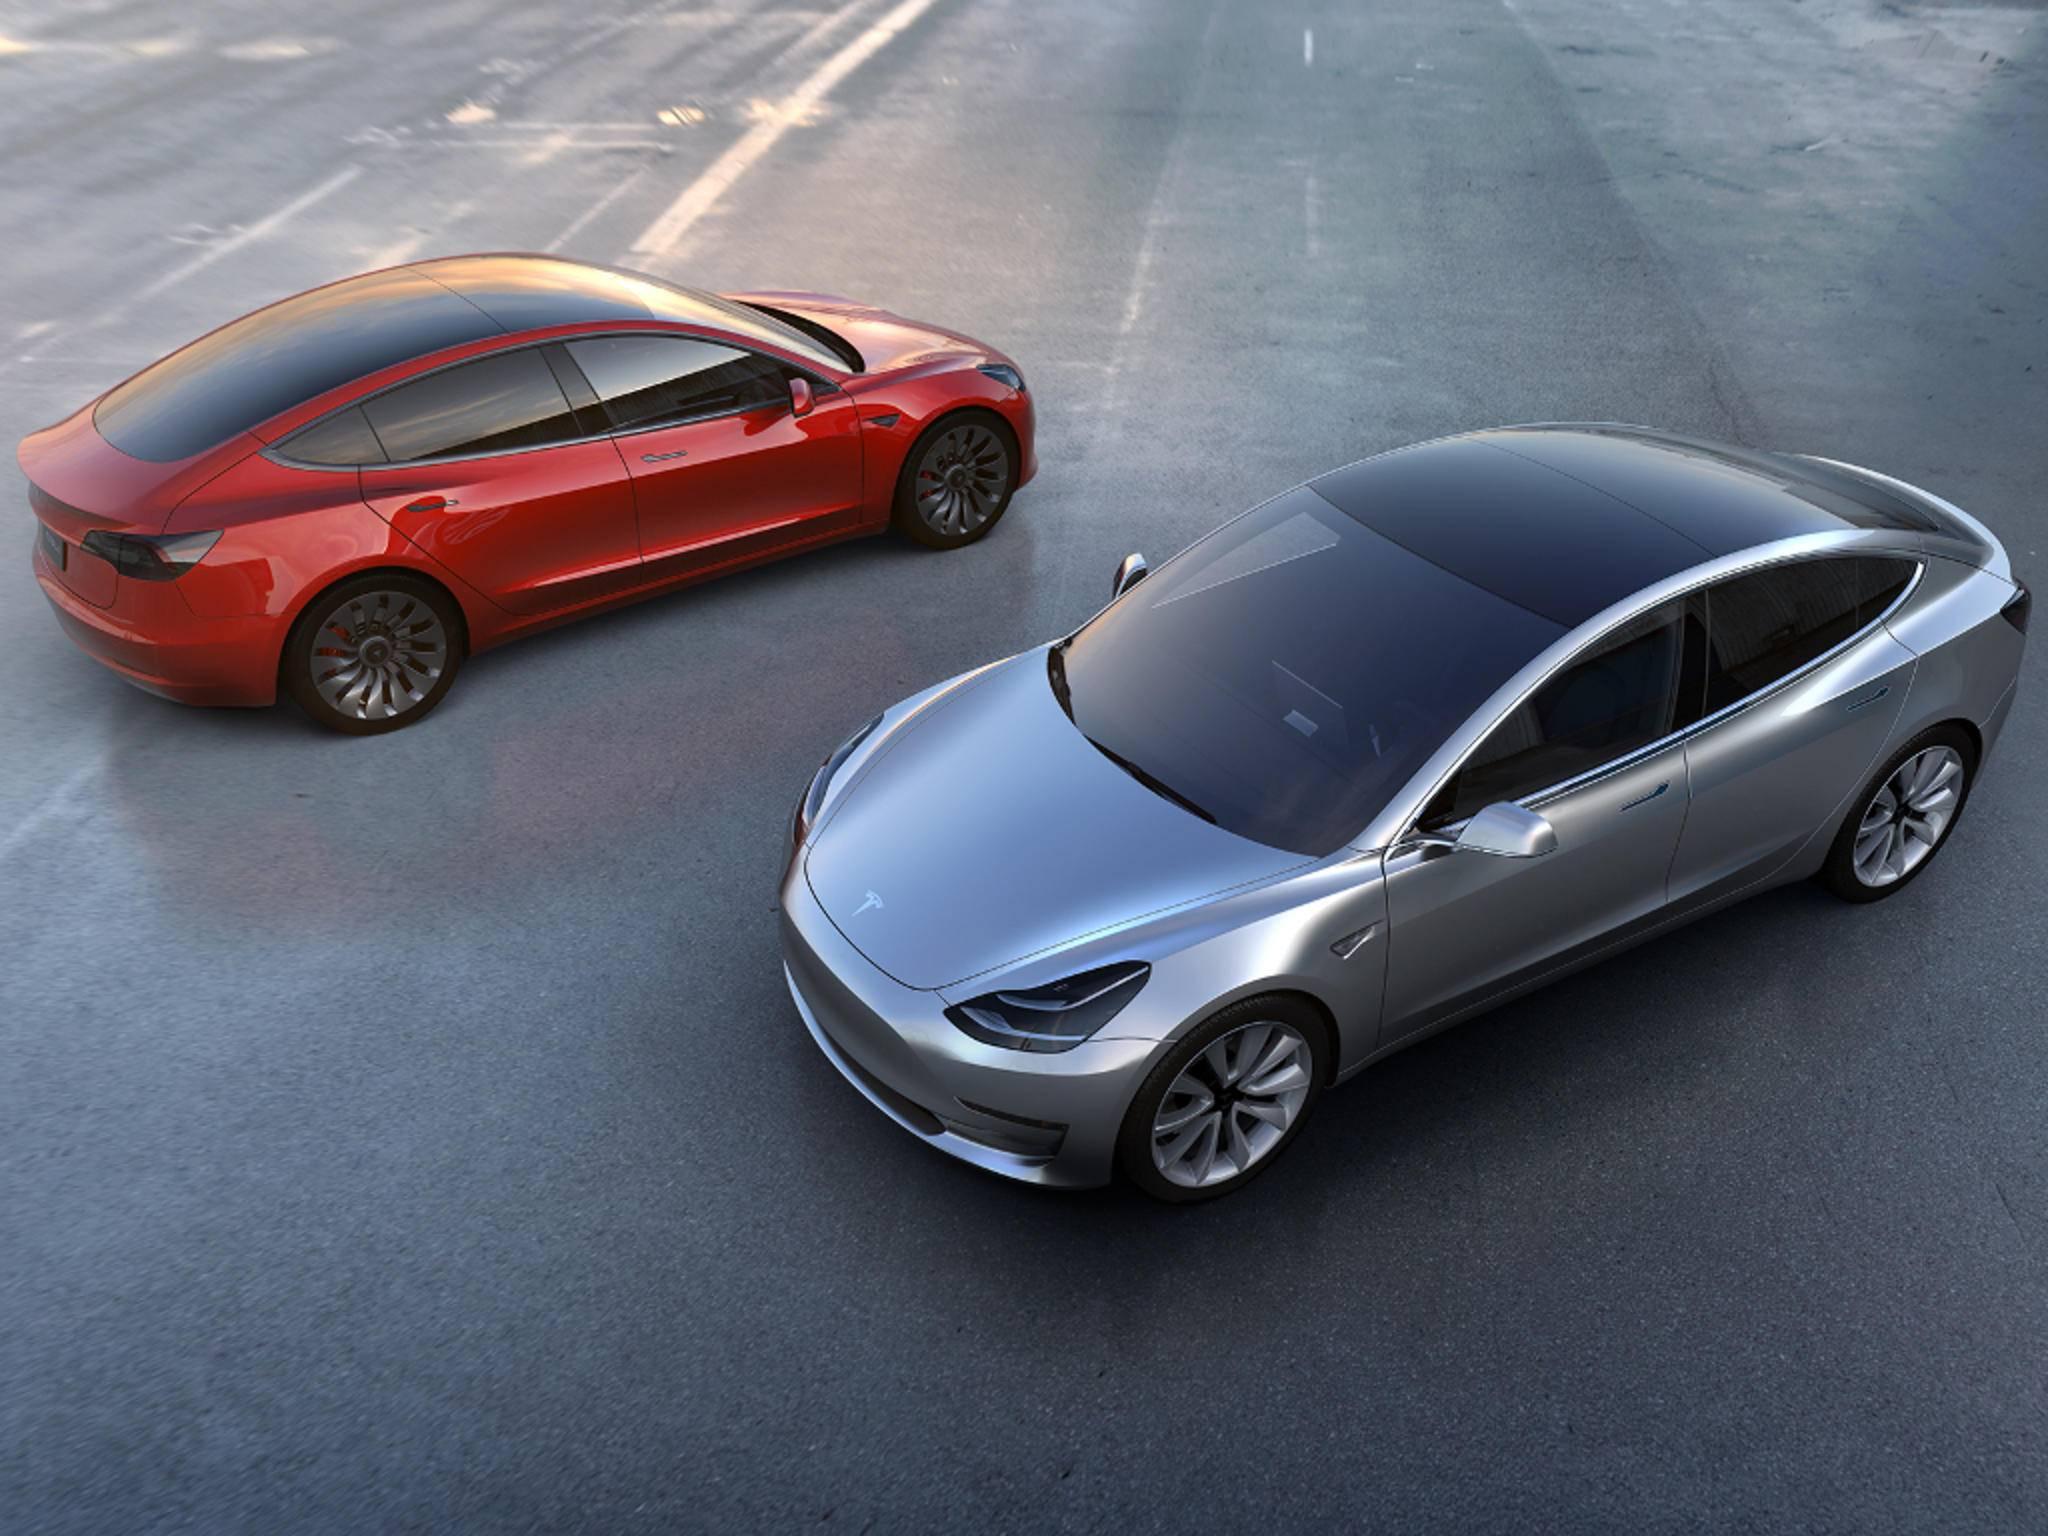 So sieht das neue Tesla Model 3 aus.